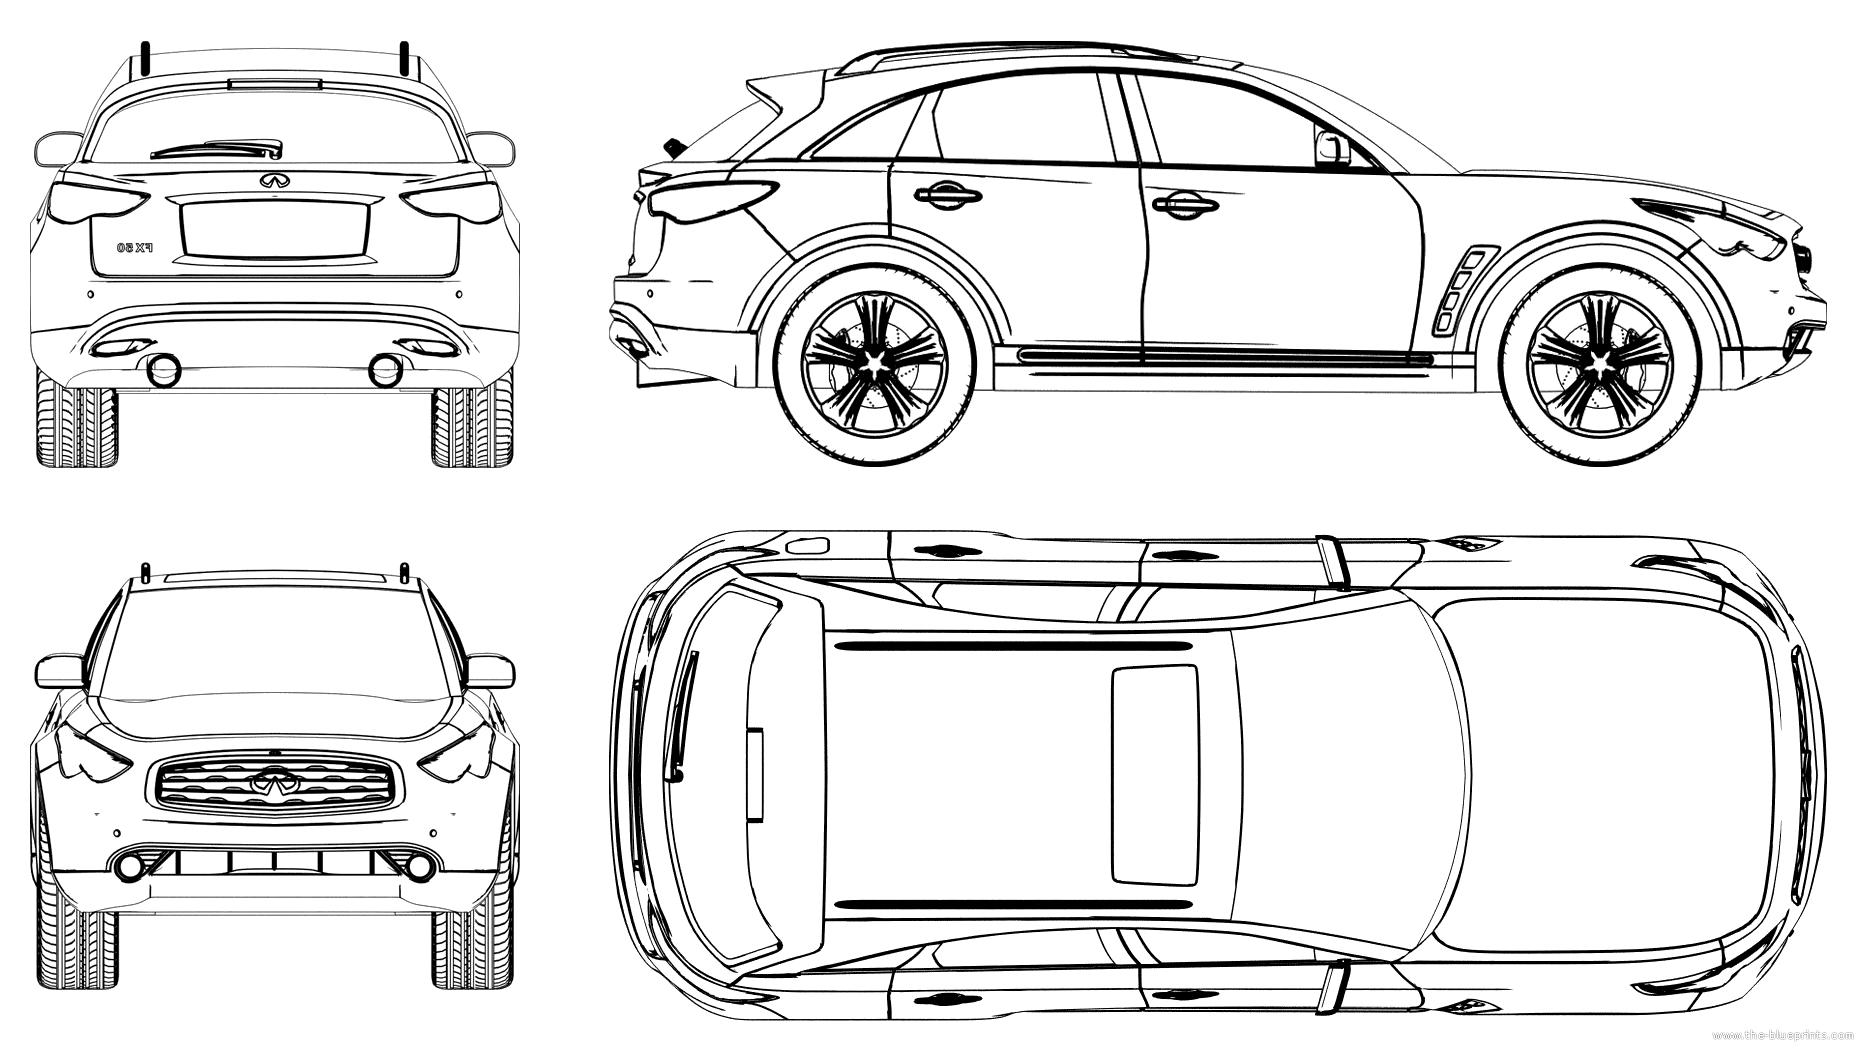 The blueprints blueprints cars infiniti infiniti fx 2009 infiniti fx 2009 malvernweather Gallery